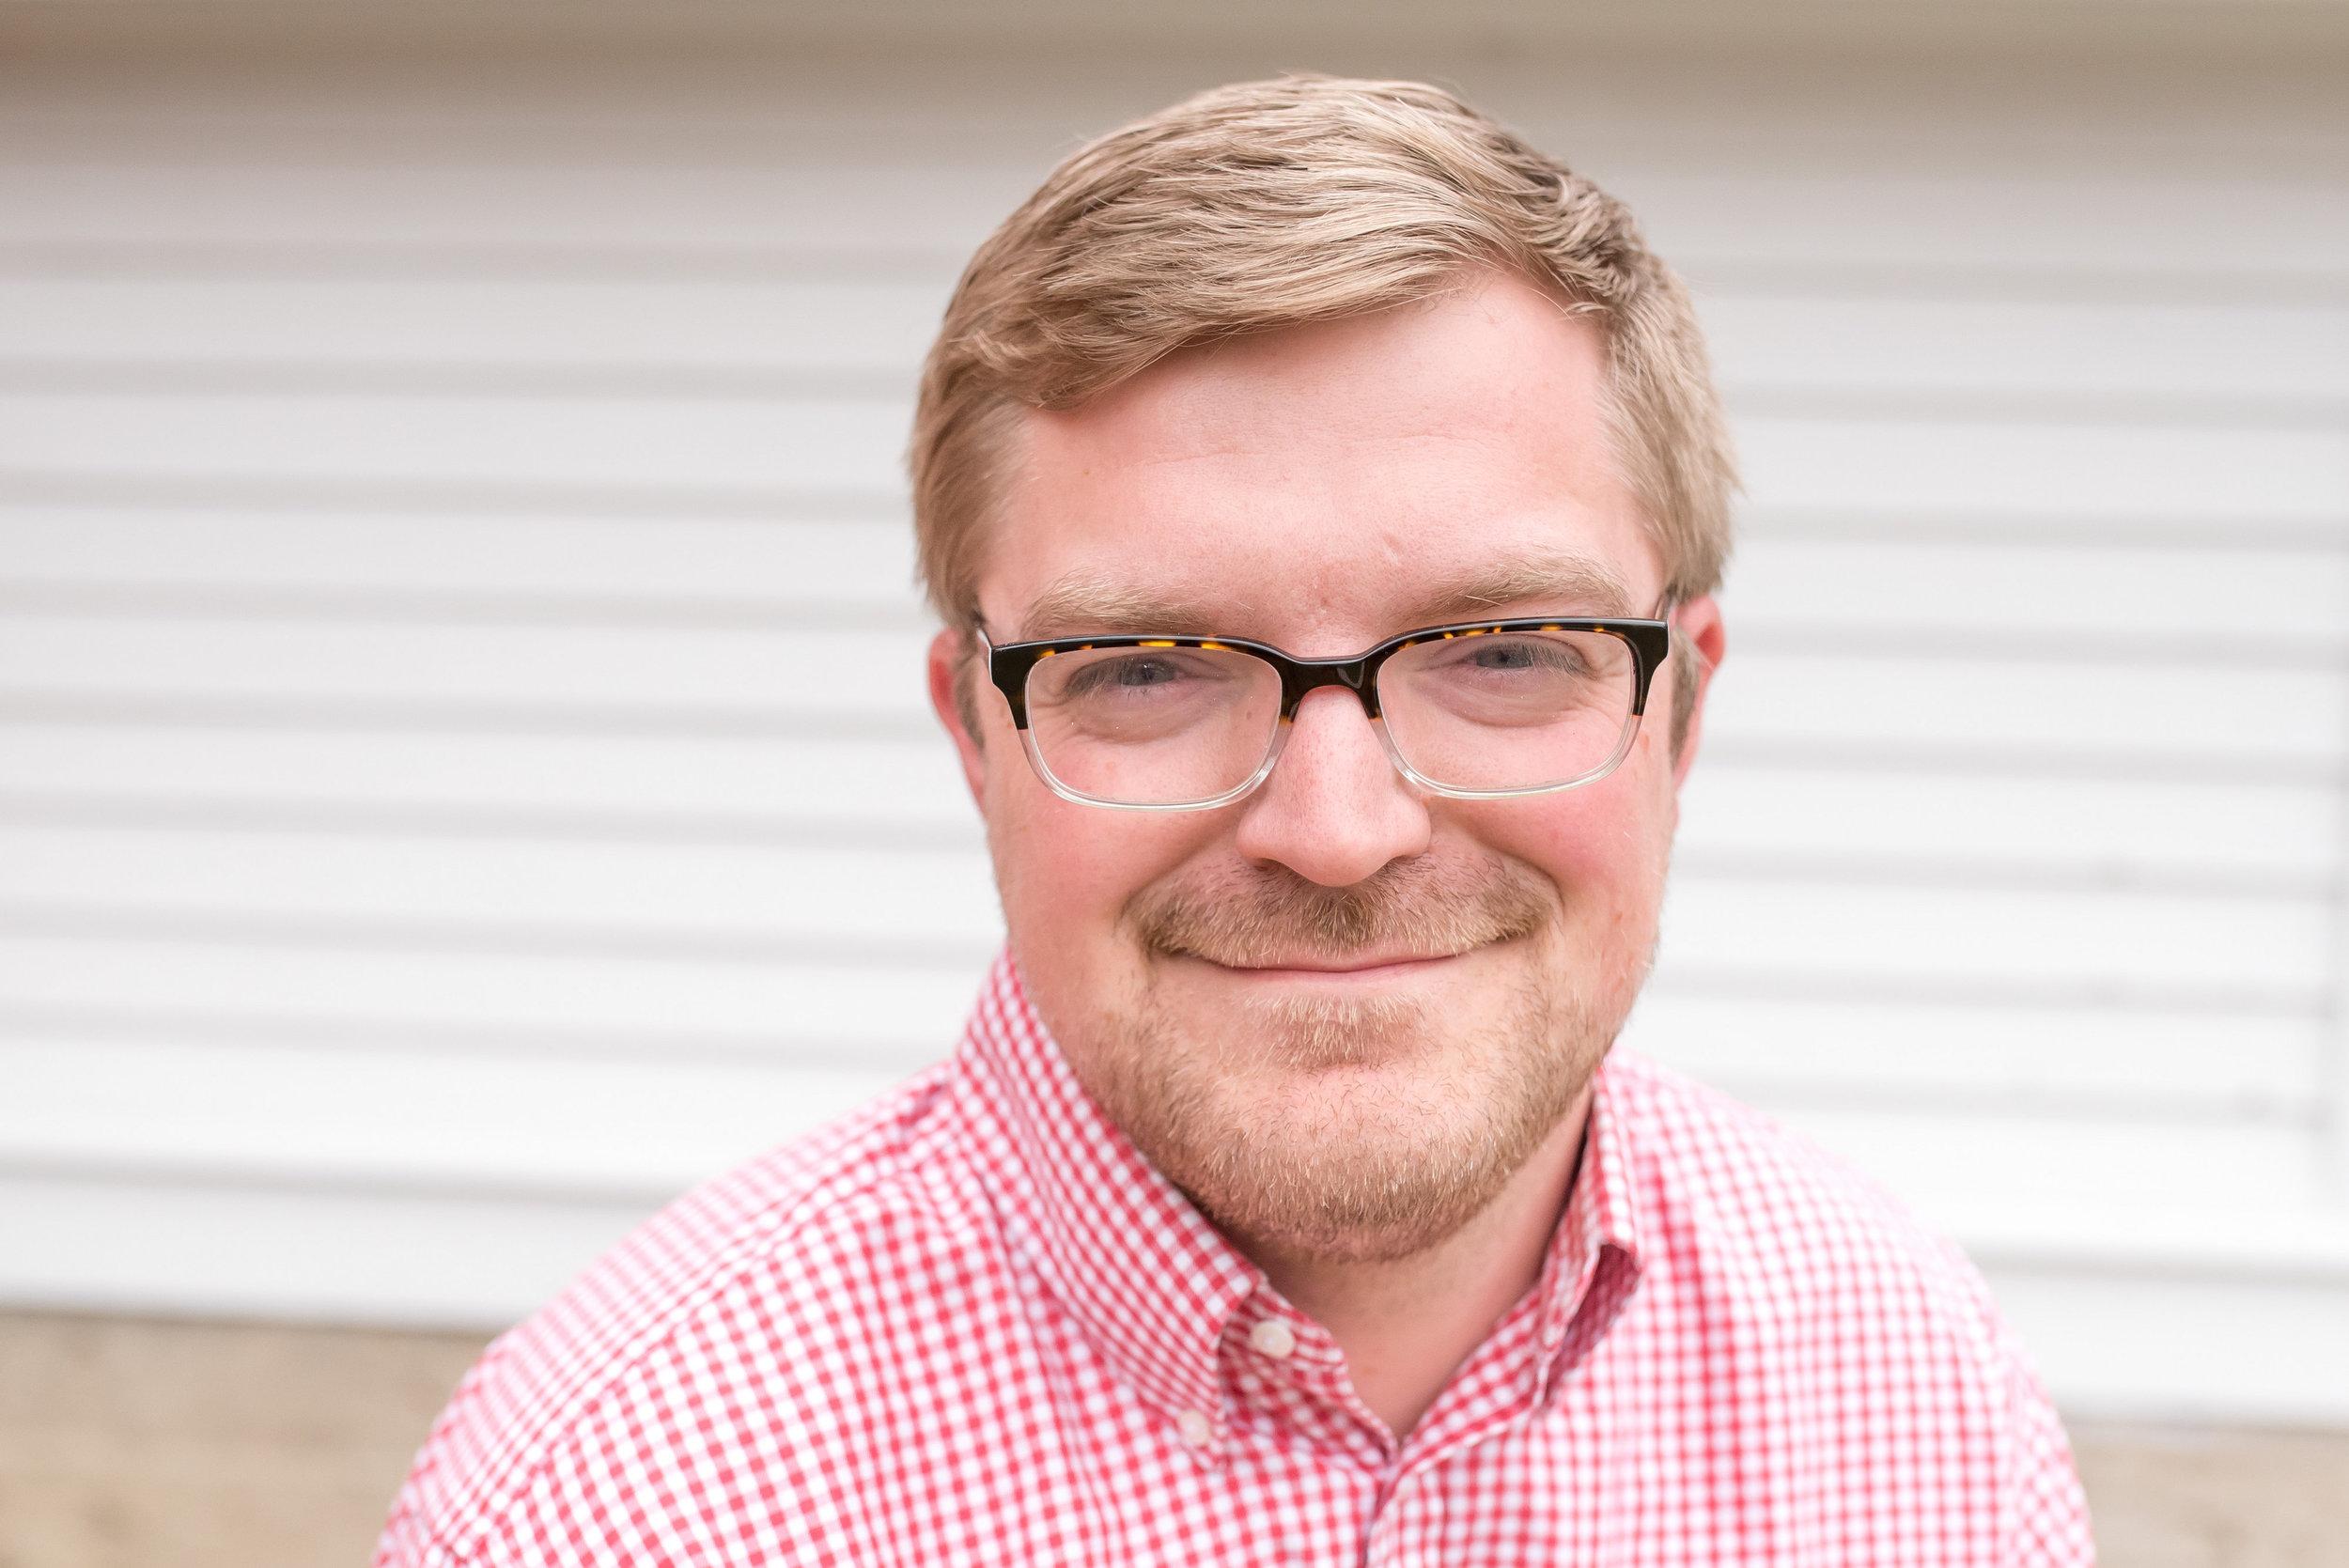 Treasuring-Christ-Church-Lead-Pastor-Michael-Guyer.jpg